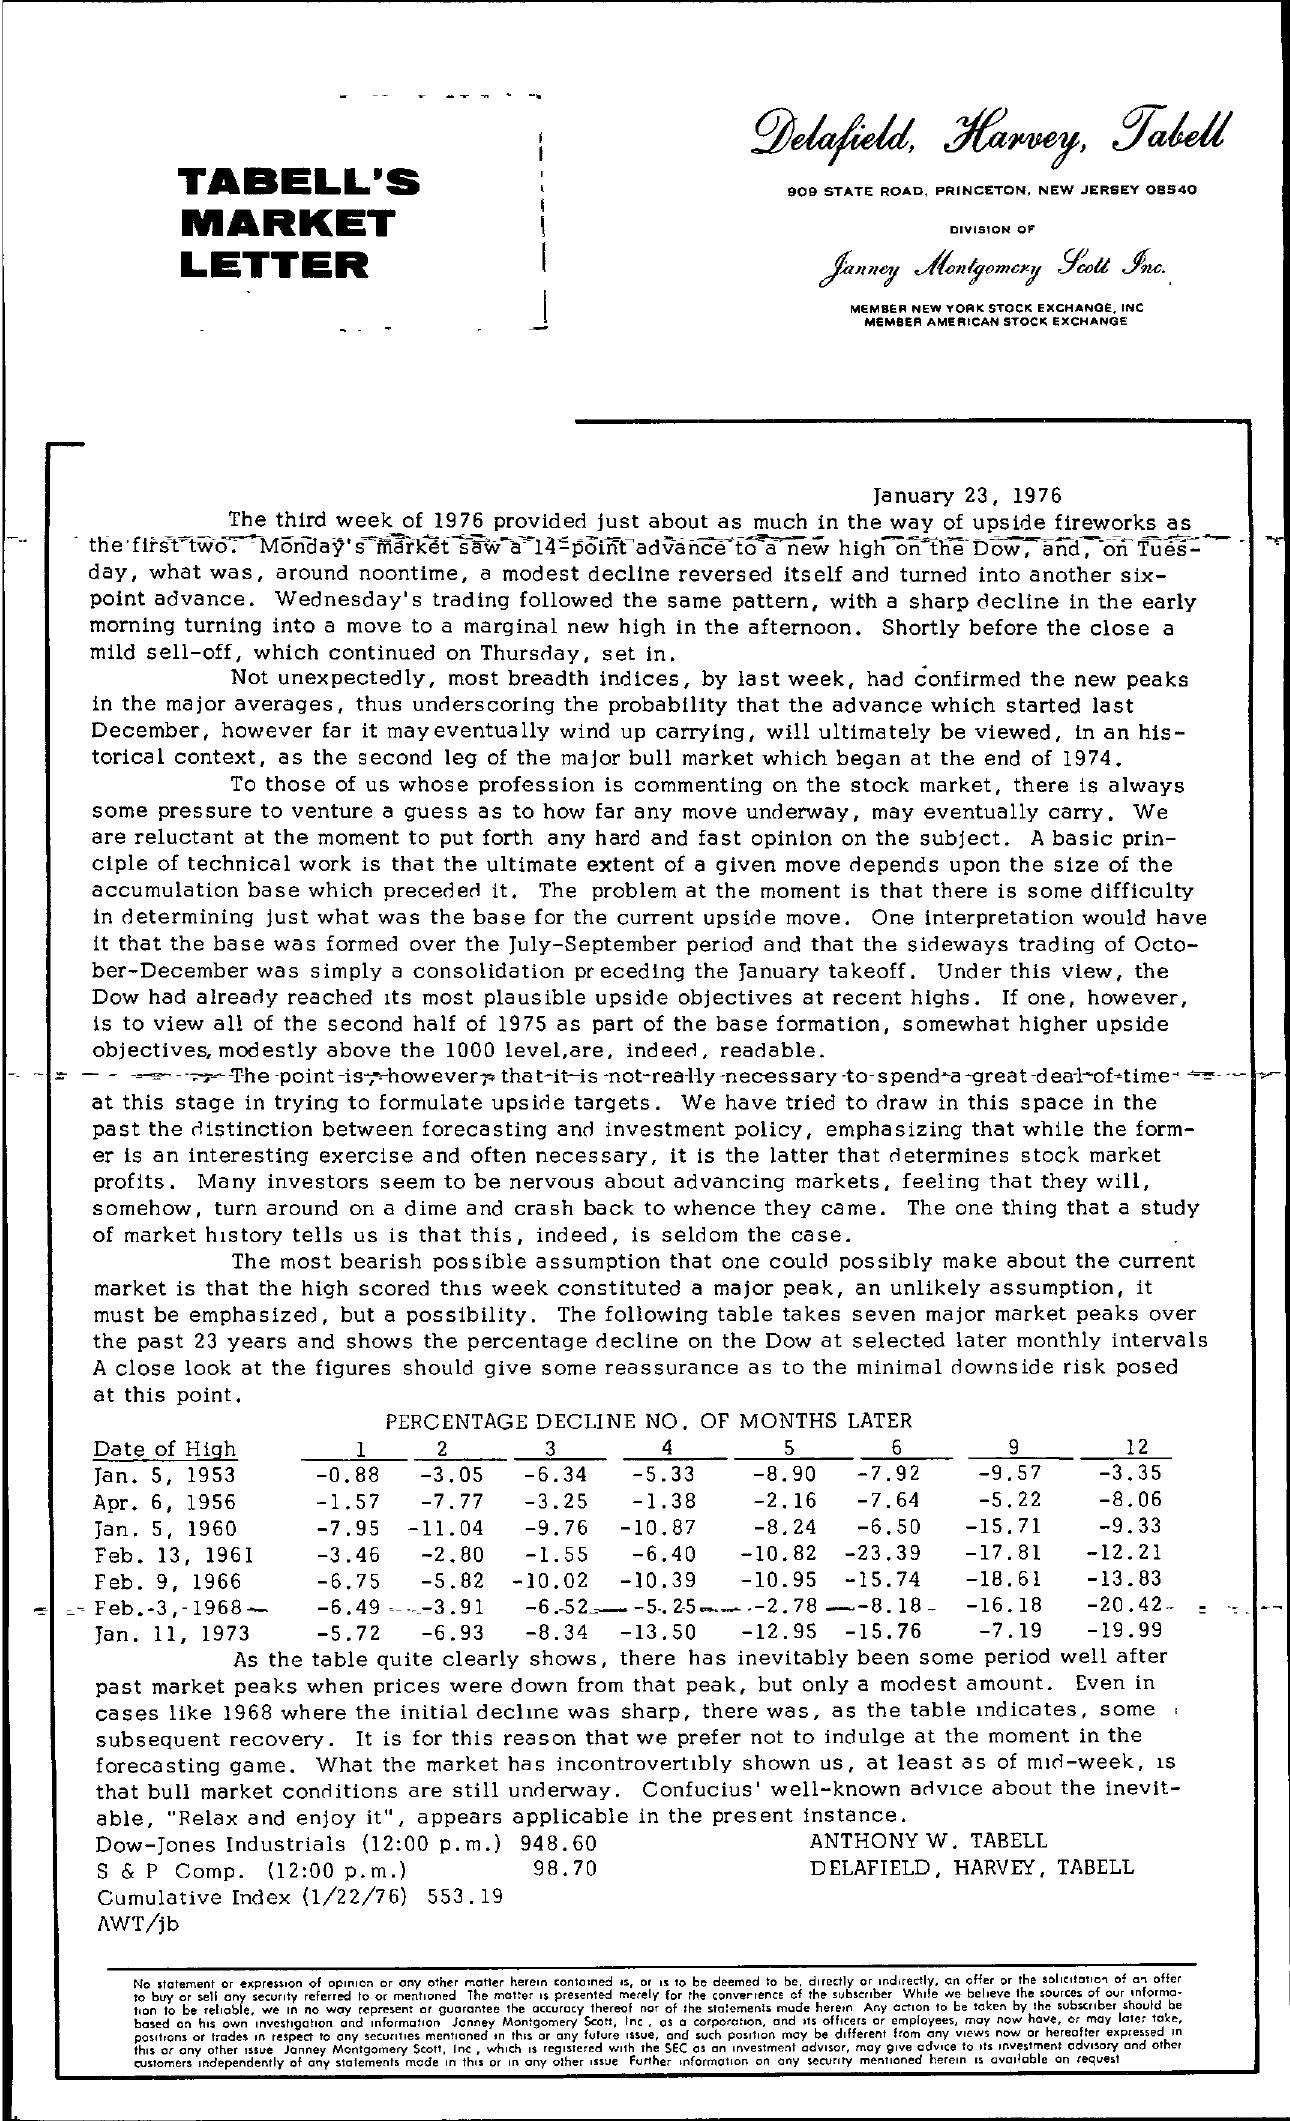 Tabell's Market Letter - January 23, 1976